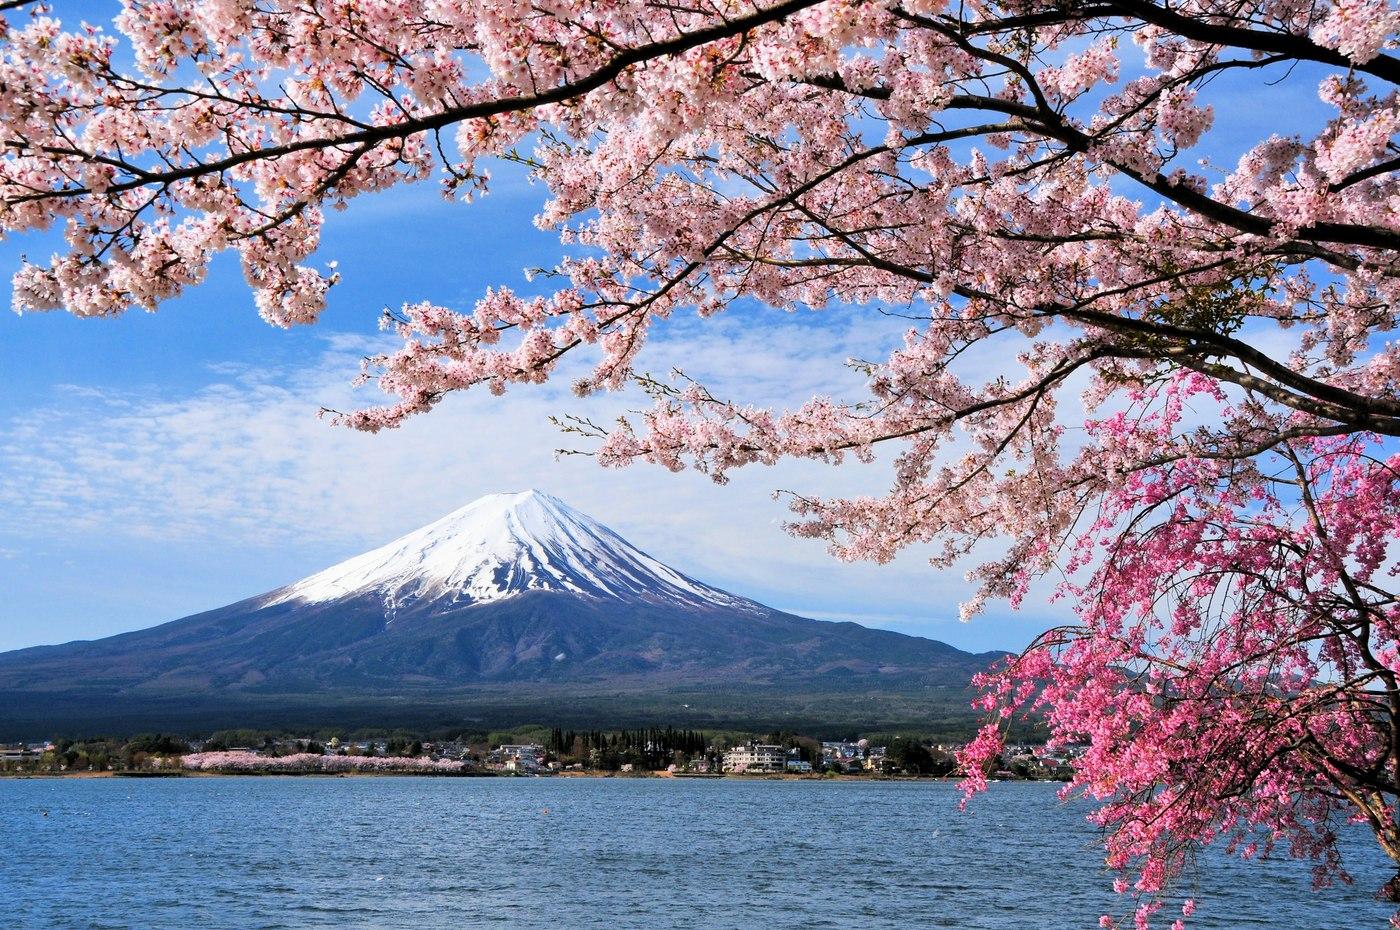 Cherry Blossom Season in Japan